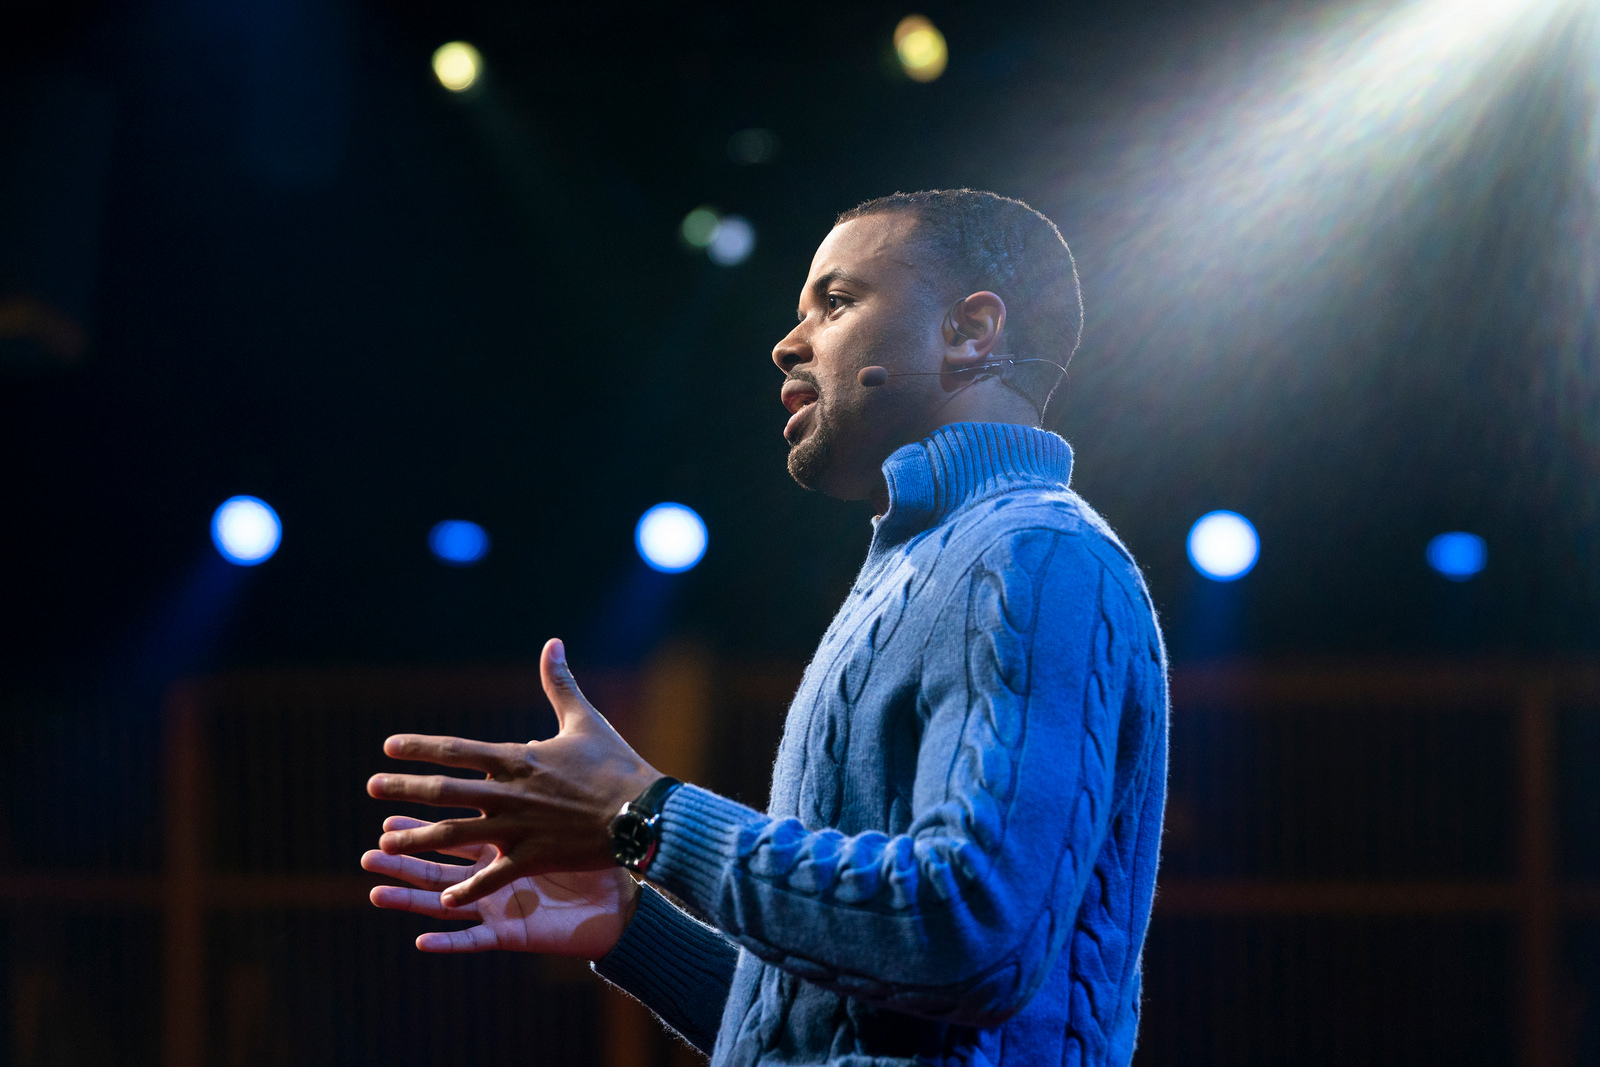 Zachary Wood. Photo: Bret Hartman / TED